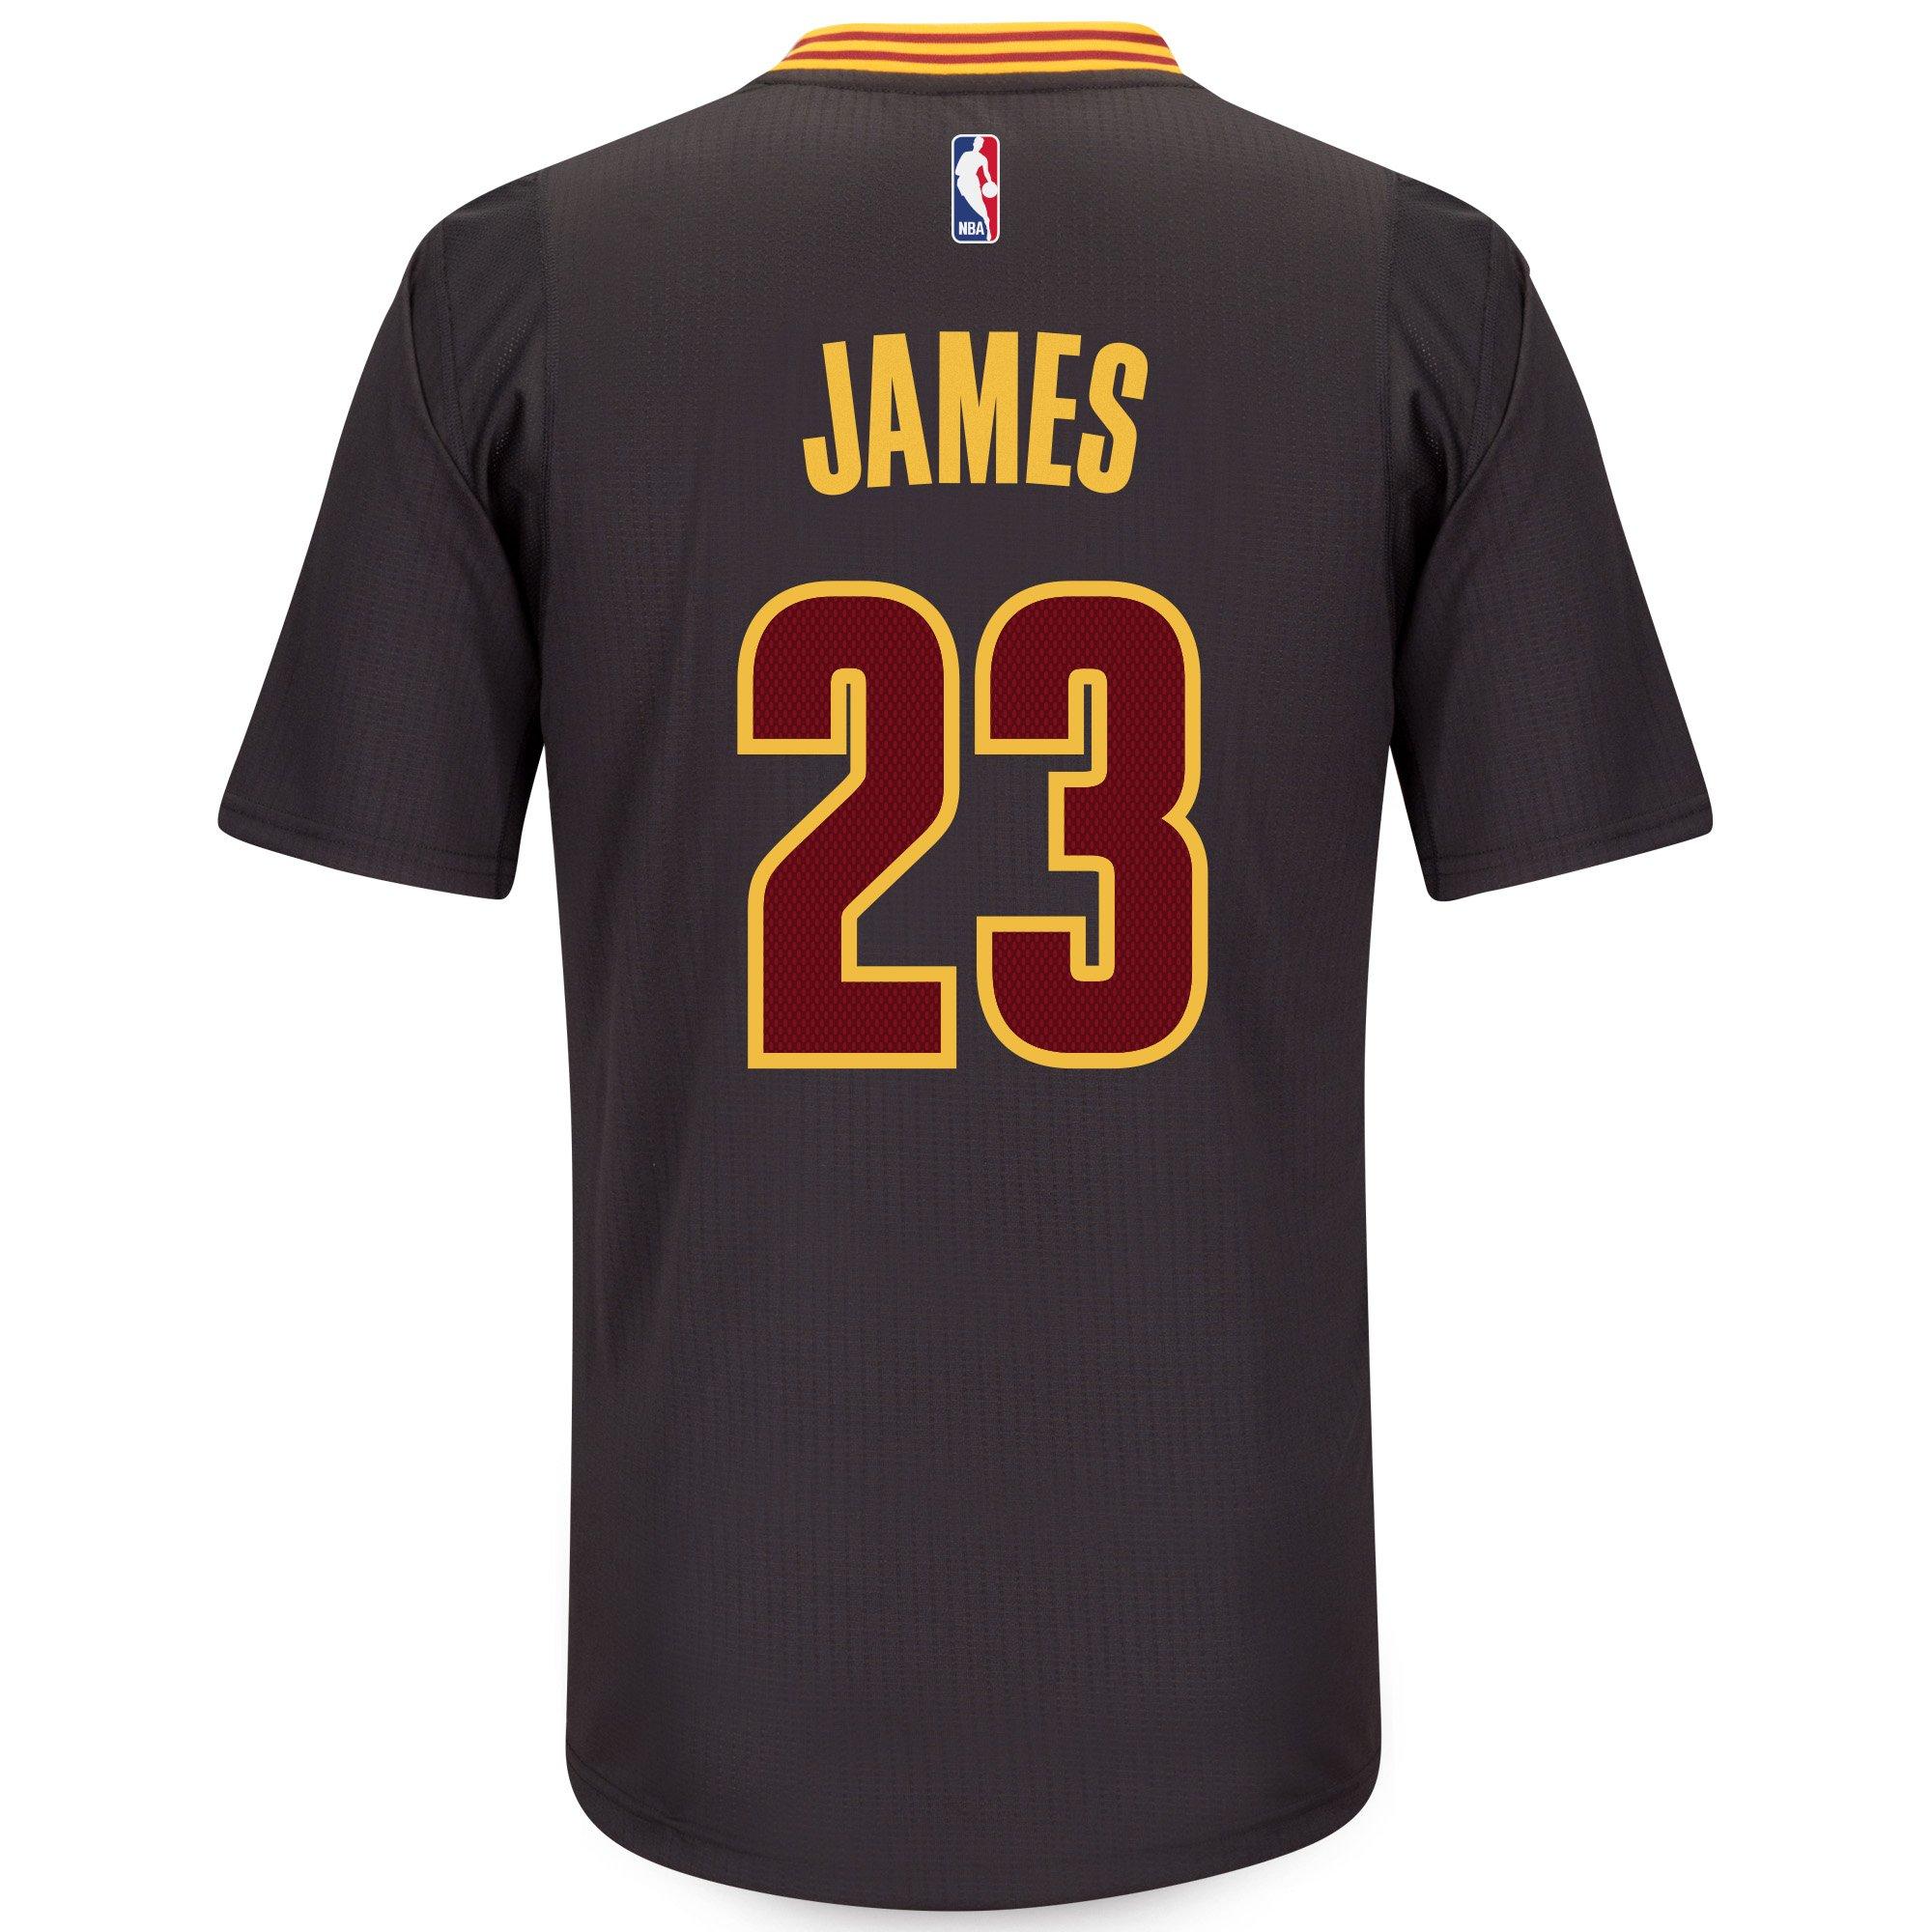 size 40 7948b a7b1c LeBron James Men's Black Cleveland Cavaliers adidas Swingman Jersey XX-large